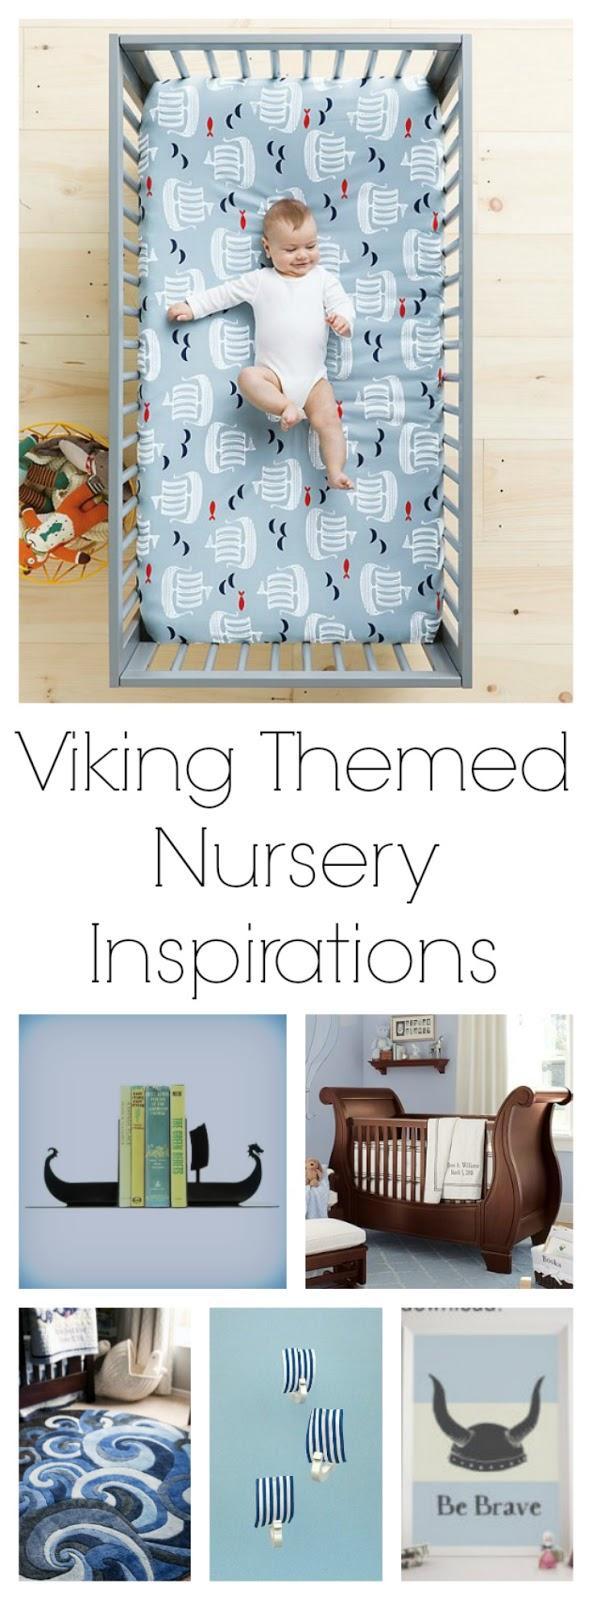 Viking Baby Bedroom: Viking Themed Nursery Ideas And Inspirations